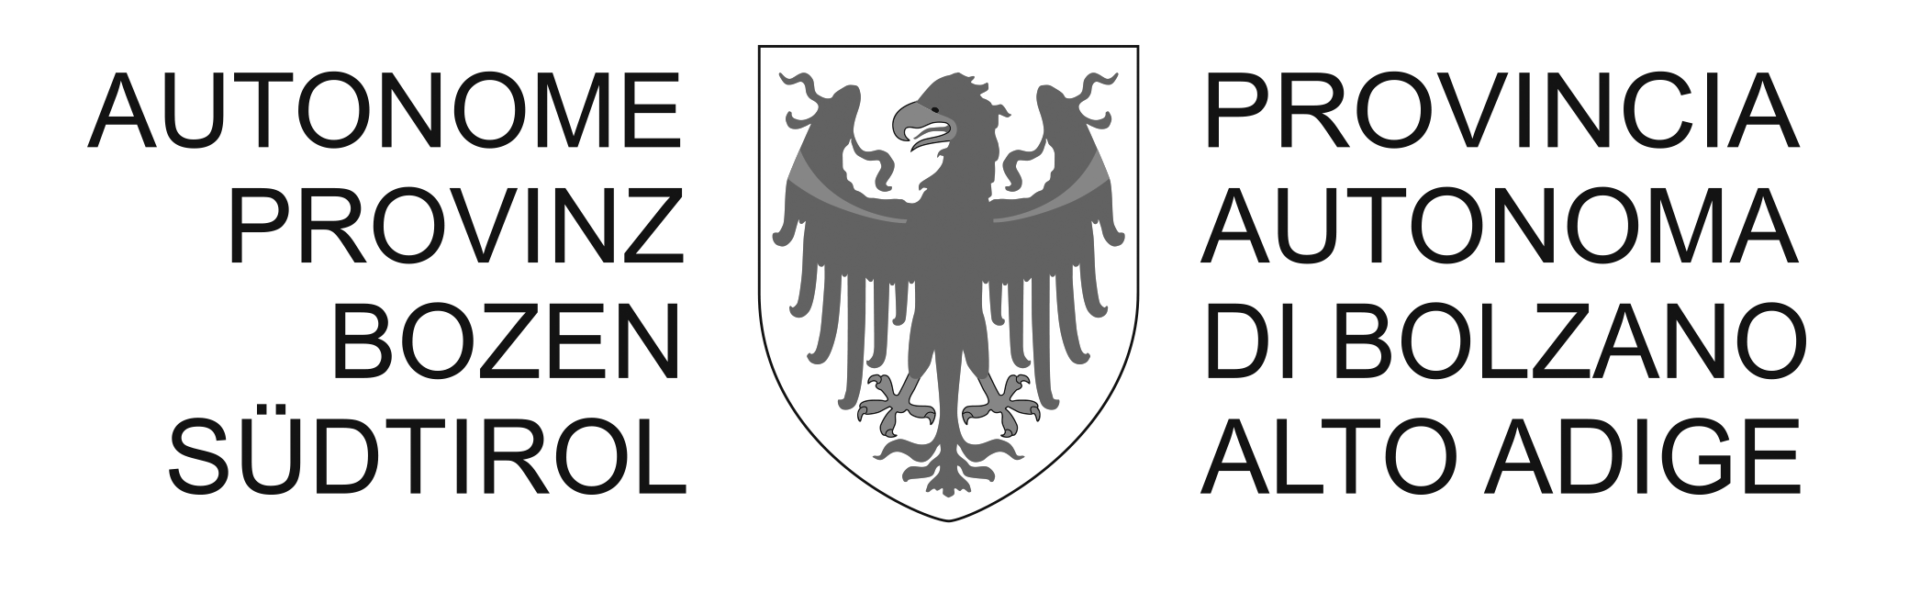 Logo Provinz Bozen - Südtirol